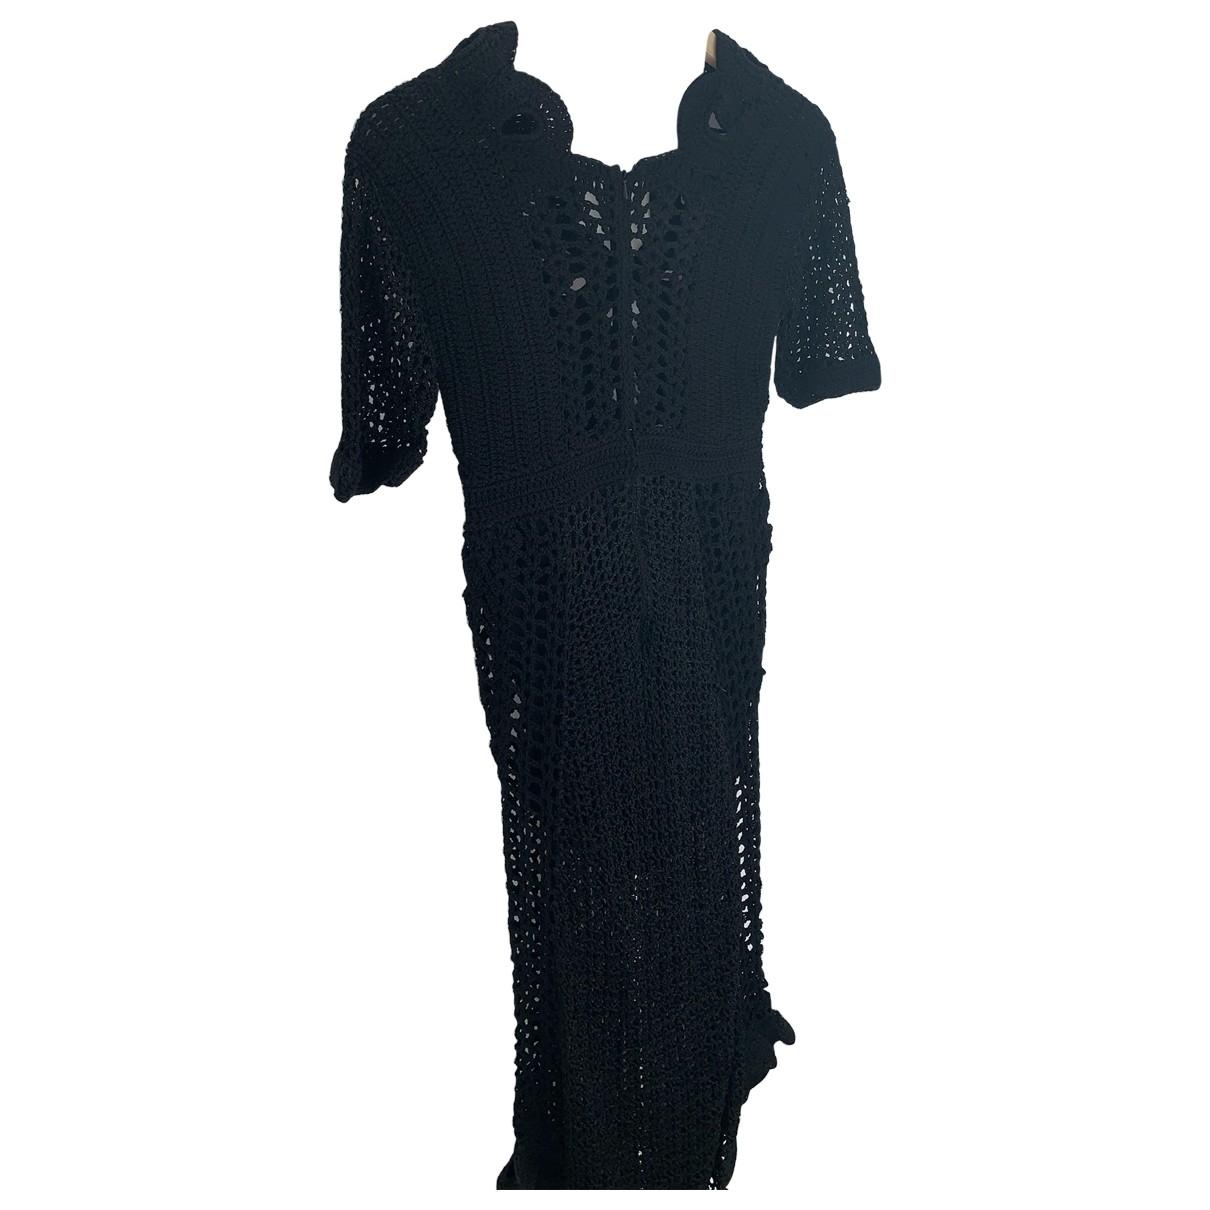 Alice Mccall N Black Cotton dress for Women 32 FR